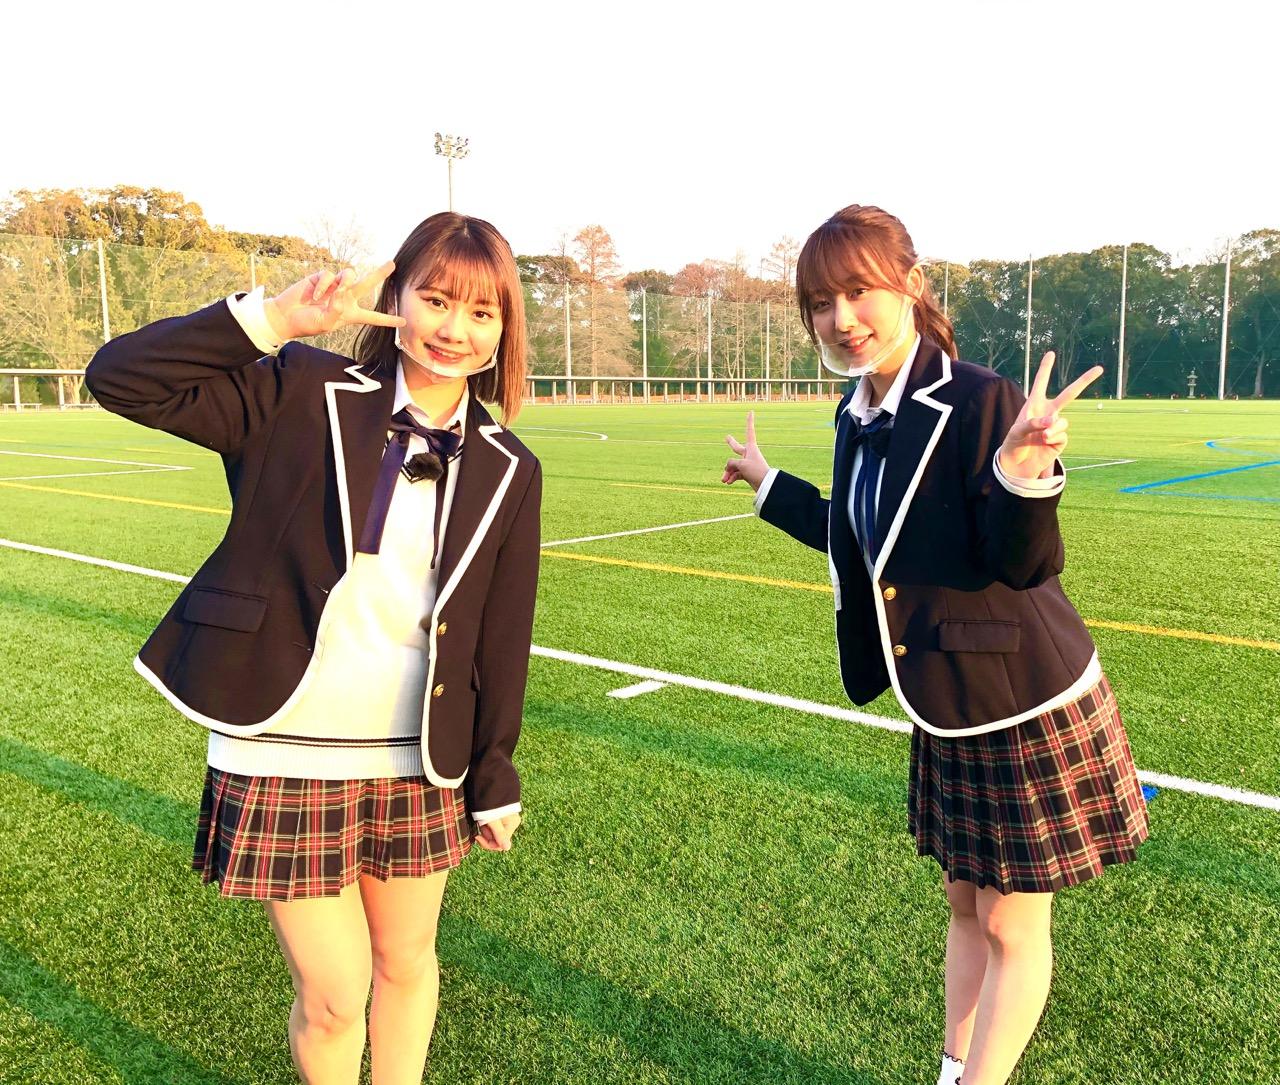 「SKE48は君と歌いたい」鎌田菜月&松本慈子が女子ラグビーチーム・PEARLSの練習場を訪れる【東海テレビ】